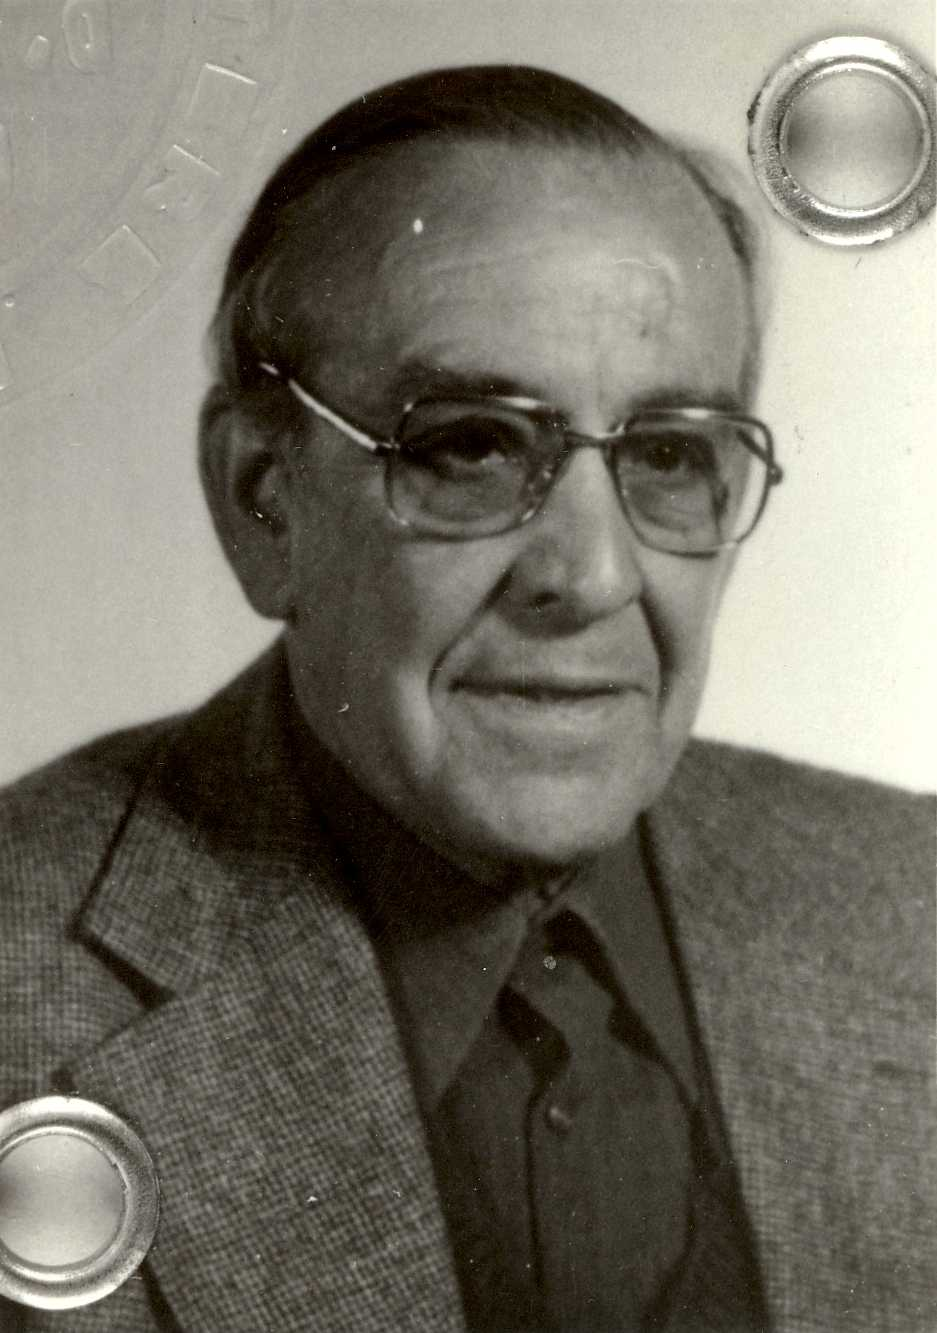 Antonio Cañete Rodríguez